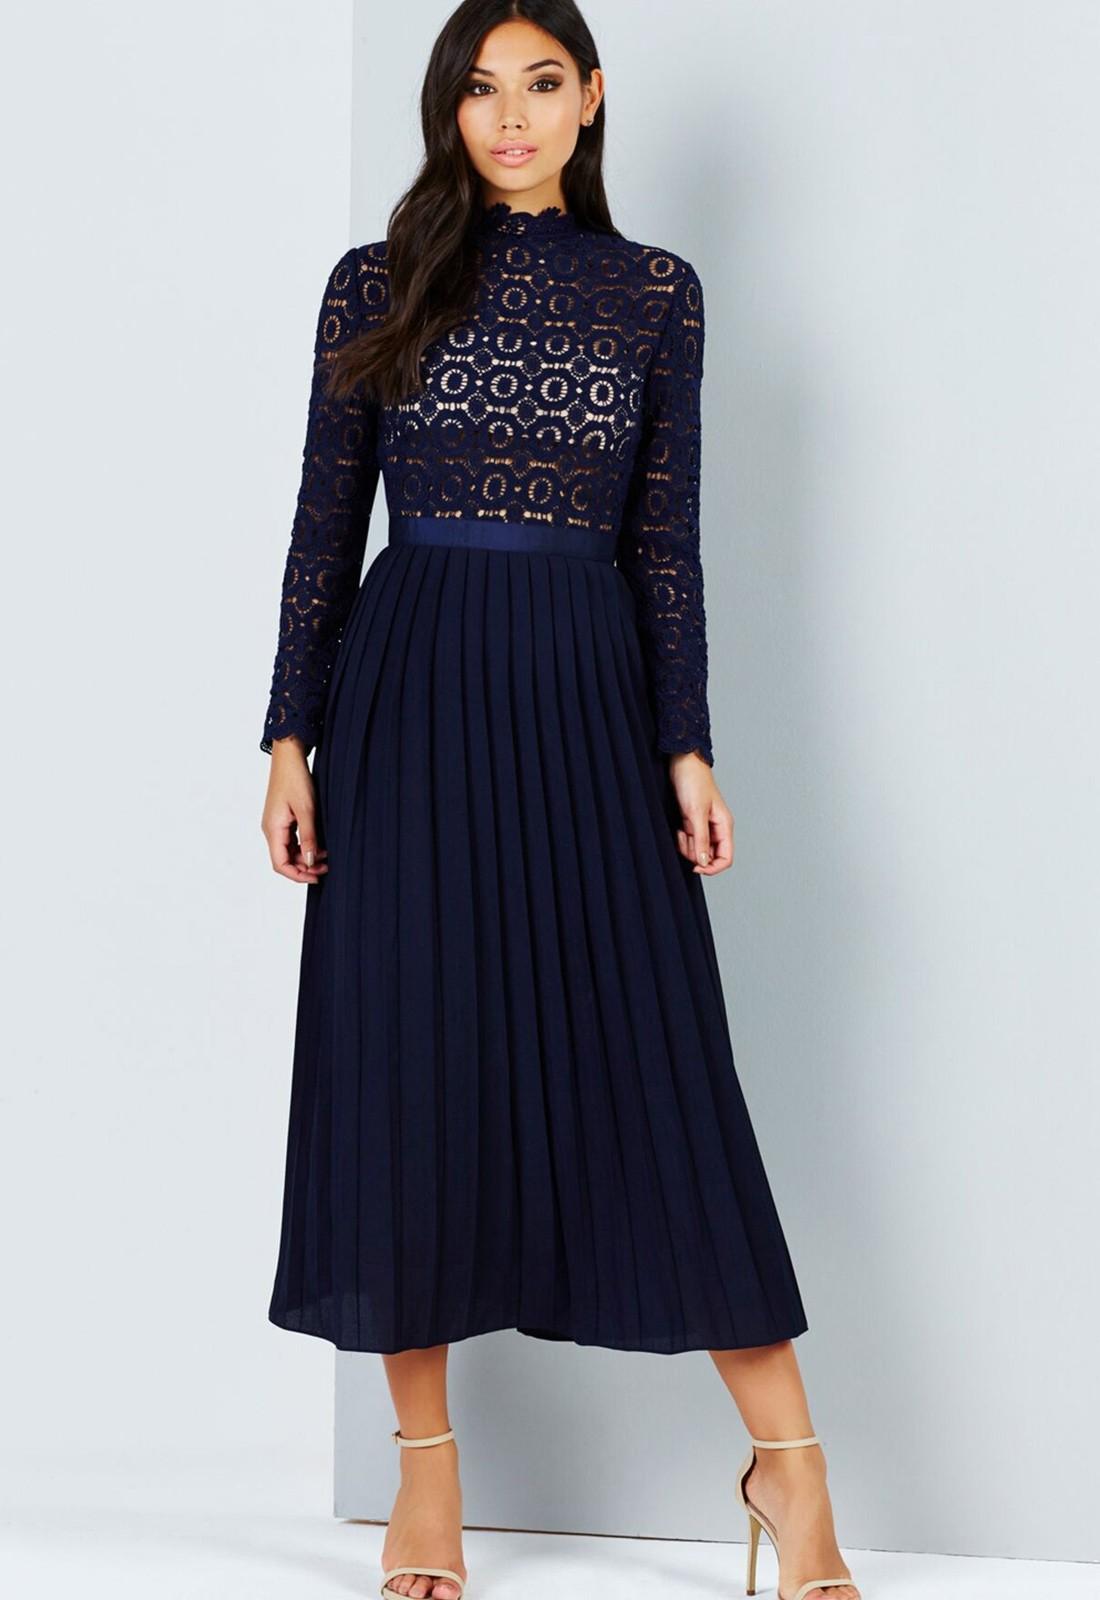 Navy Crochet Lace Midi Dress With Pleated Skirt - Elsieu0026#39;s ...